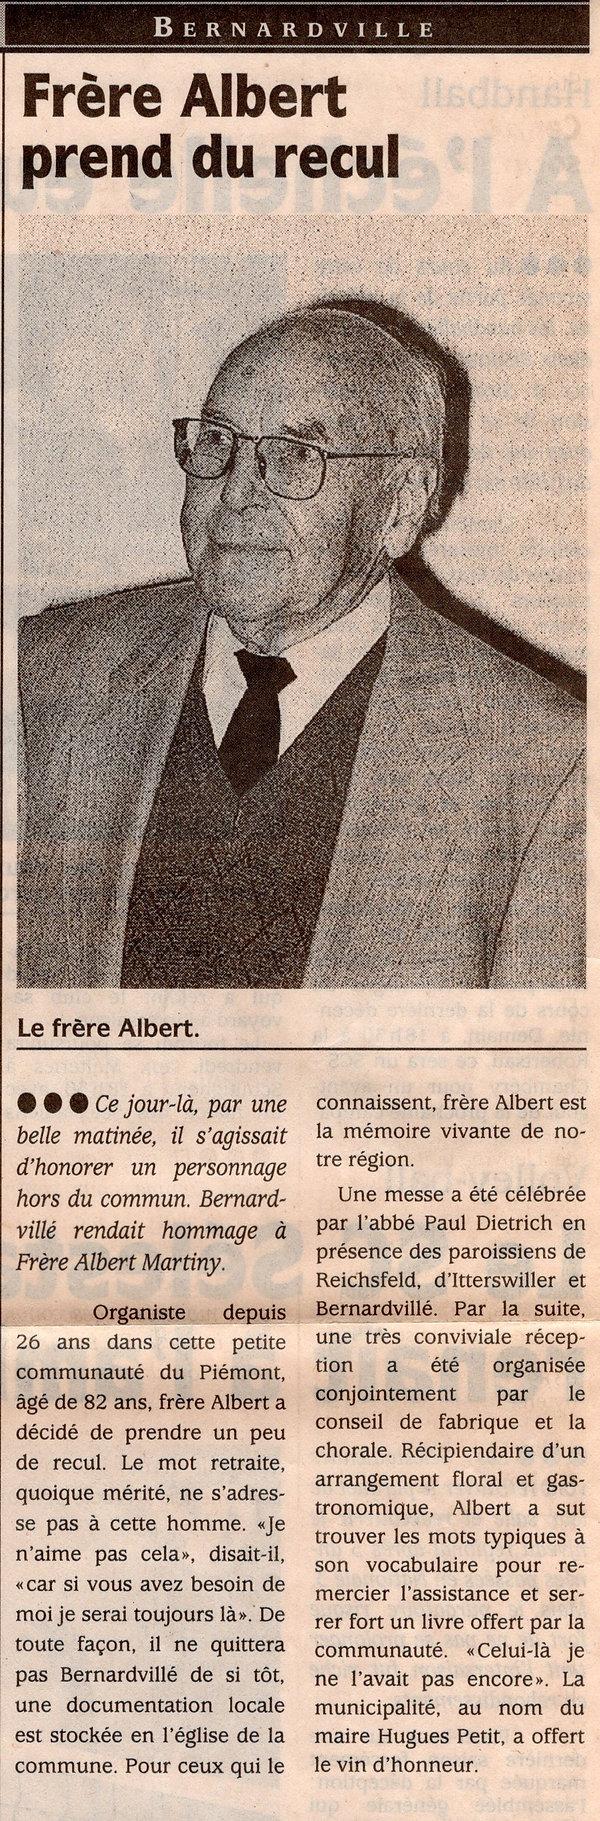 Frère Alabert 2001 Bernardvillé444 (Copi